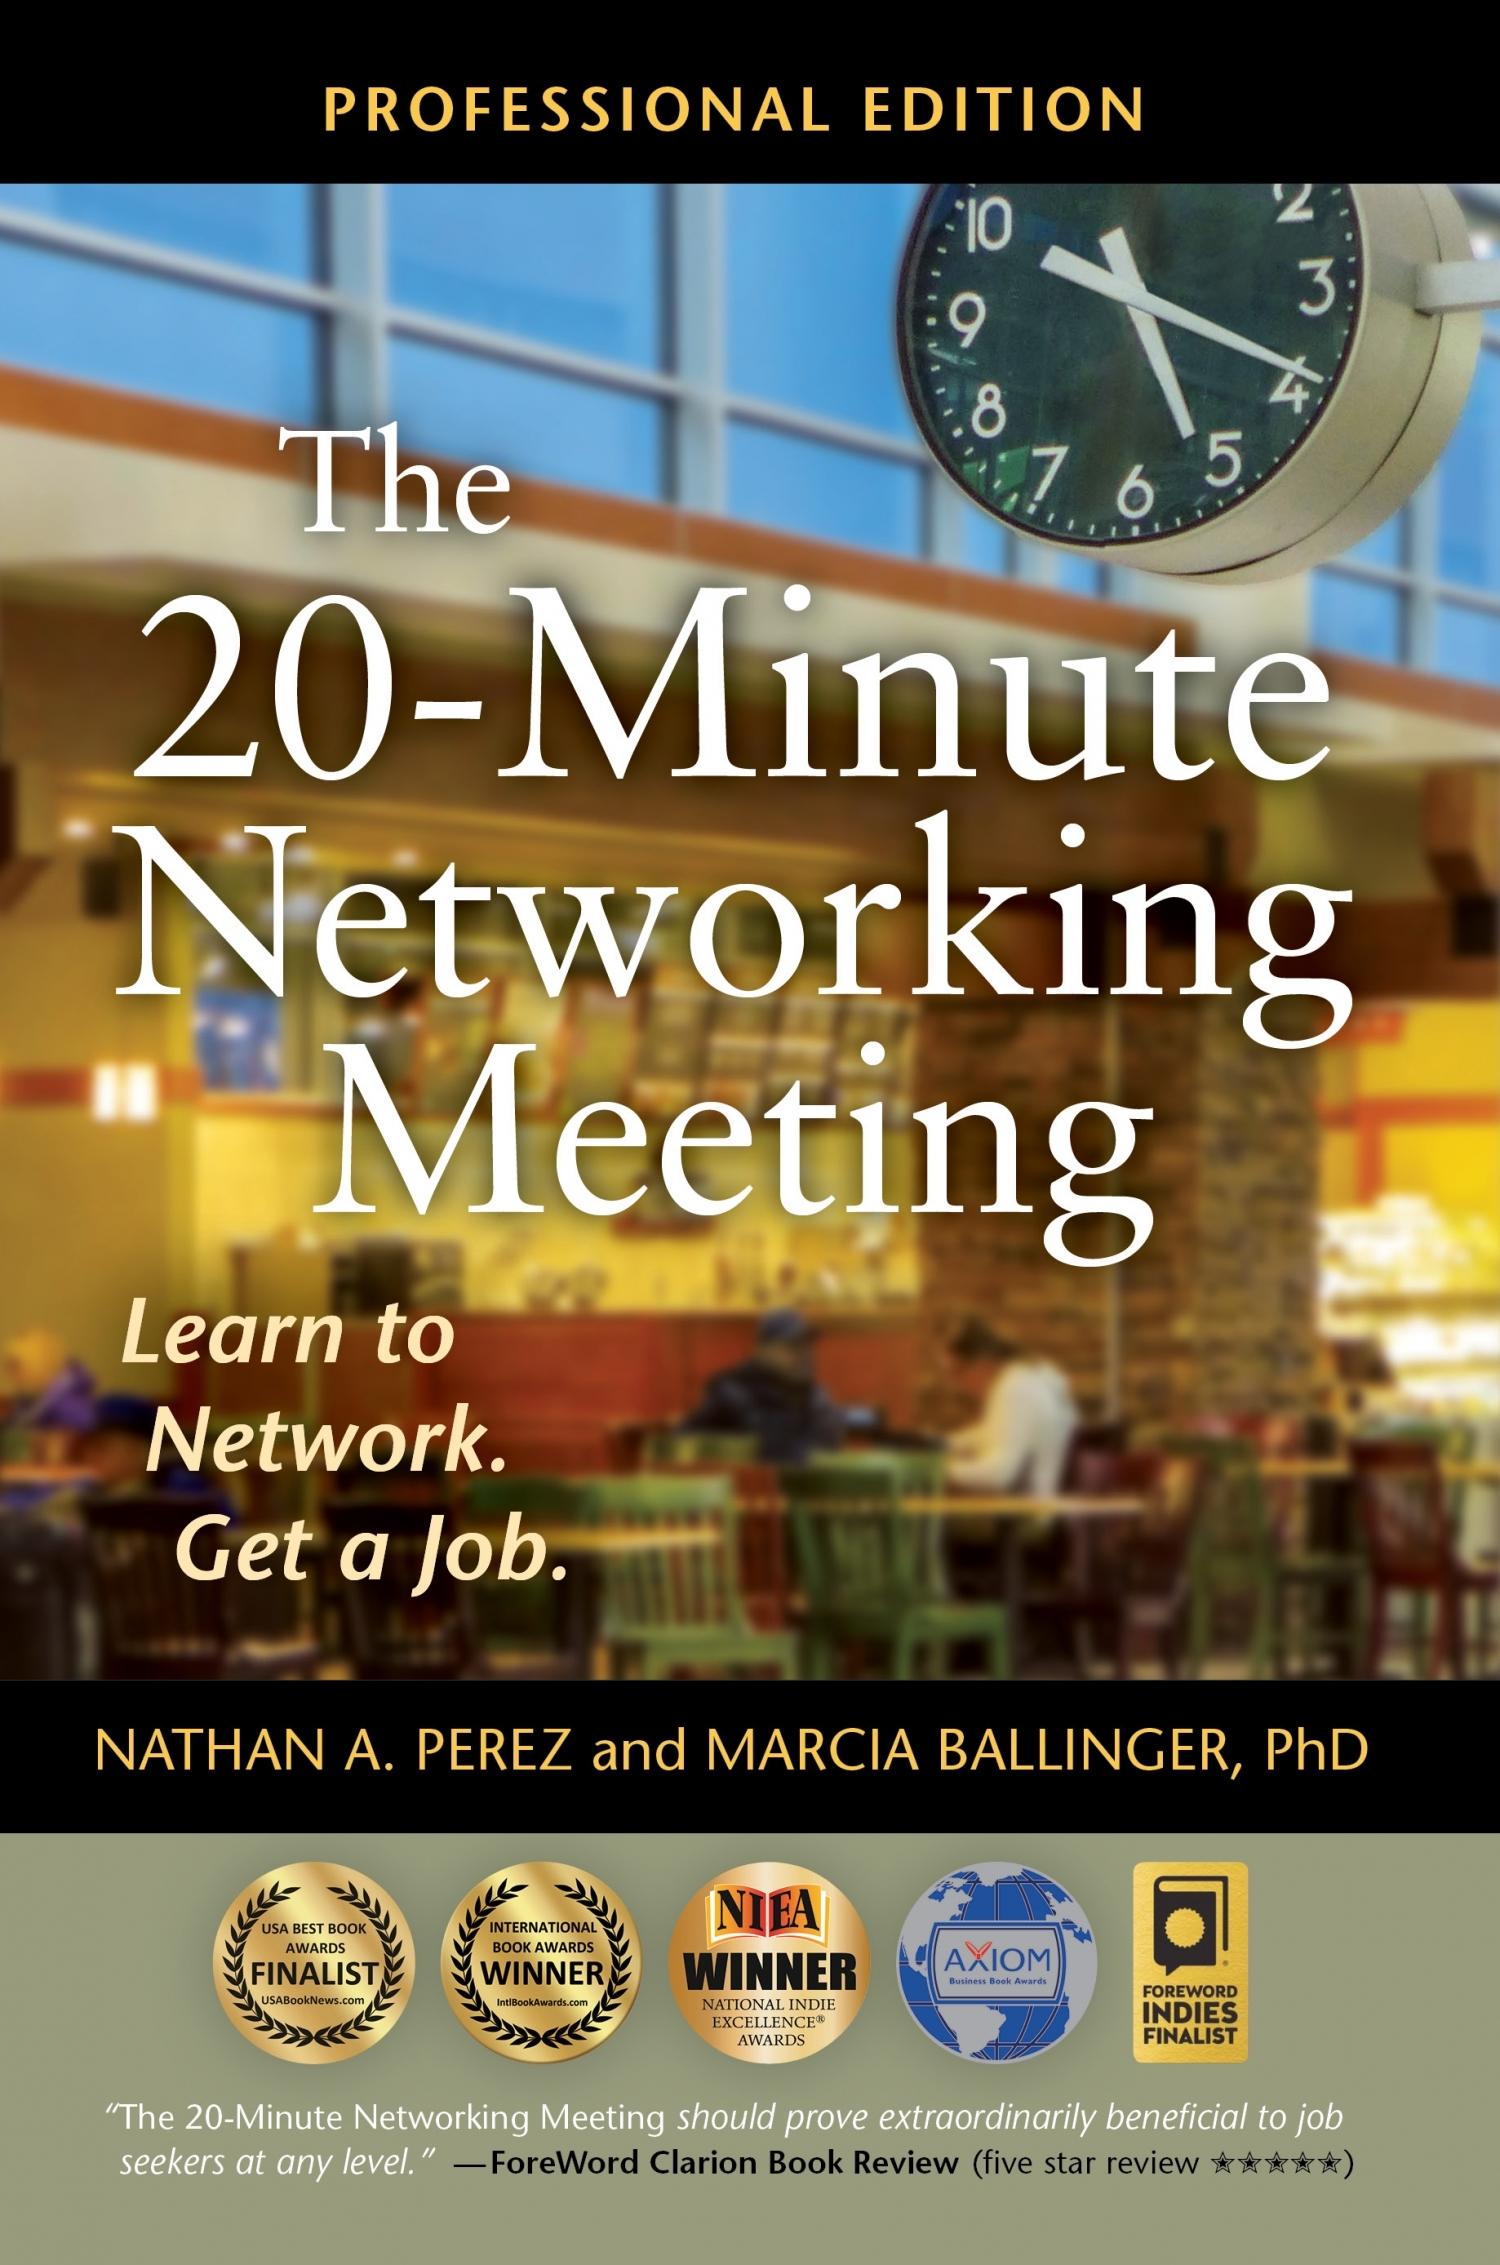 the-20-minute-networking-meeting.jpg